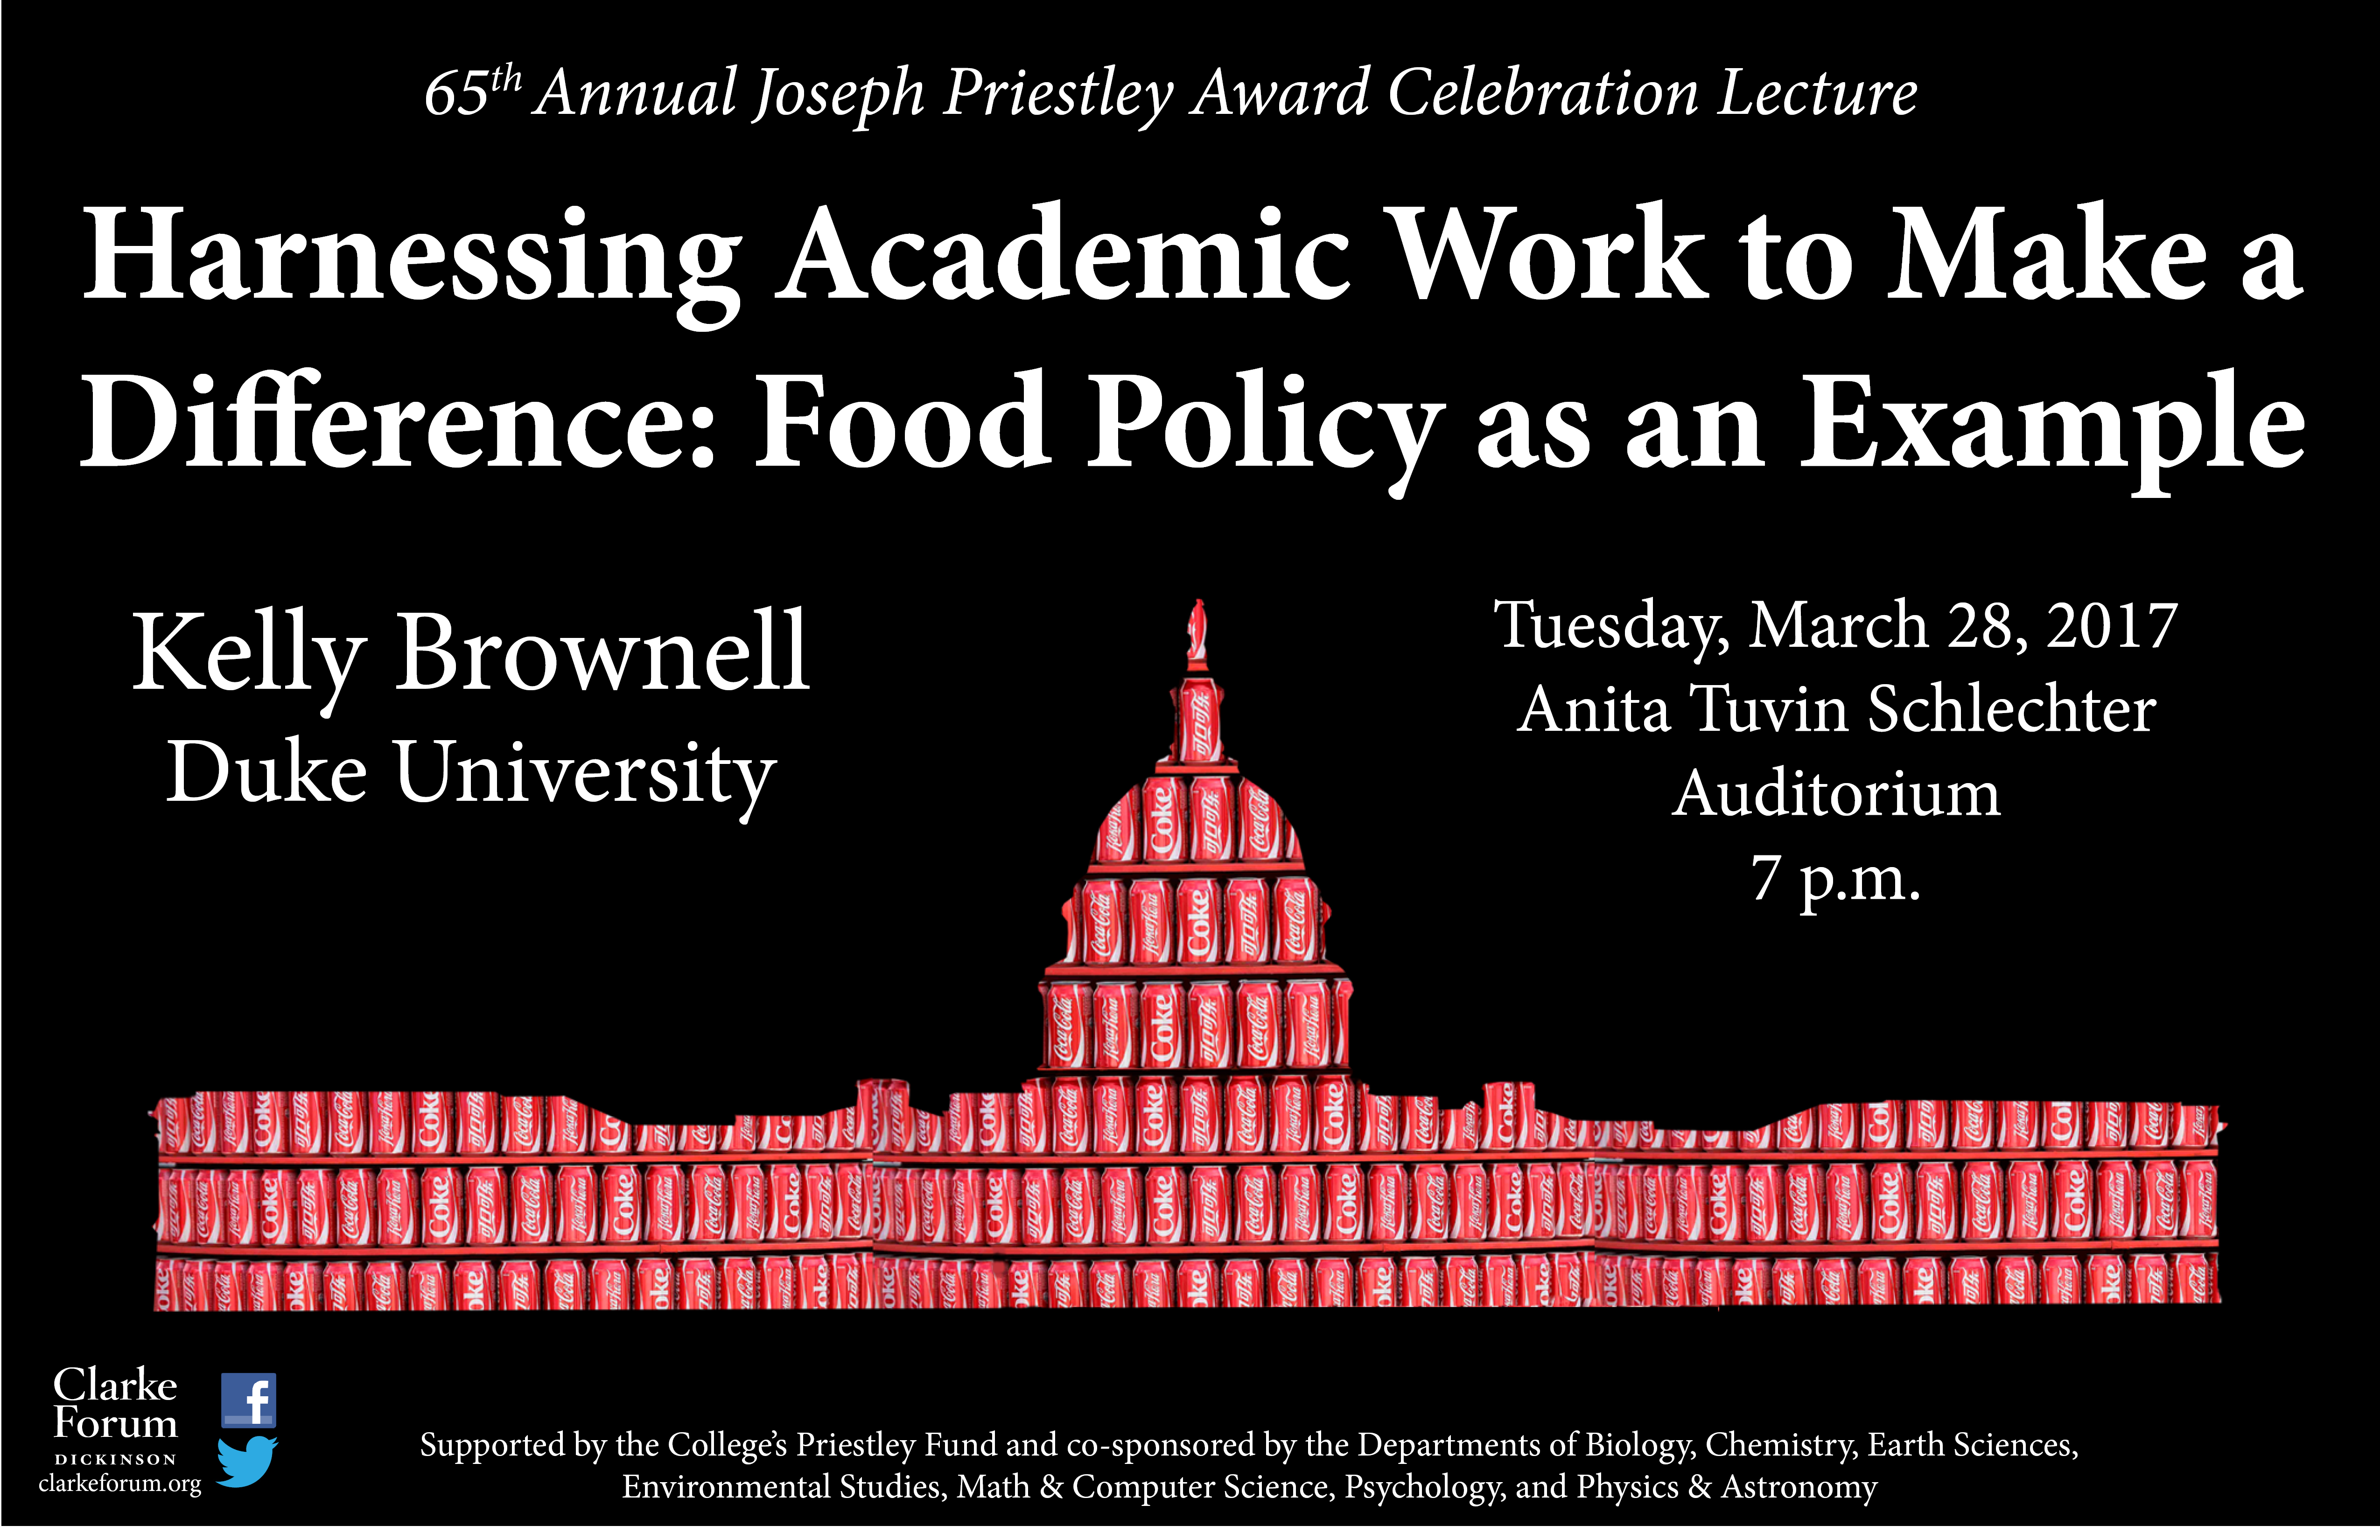 Duke University Joseph Priestley Award Celebration Lecture